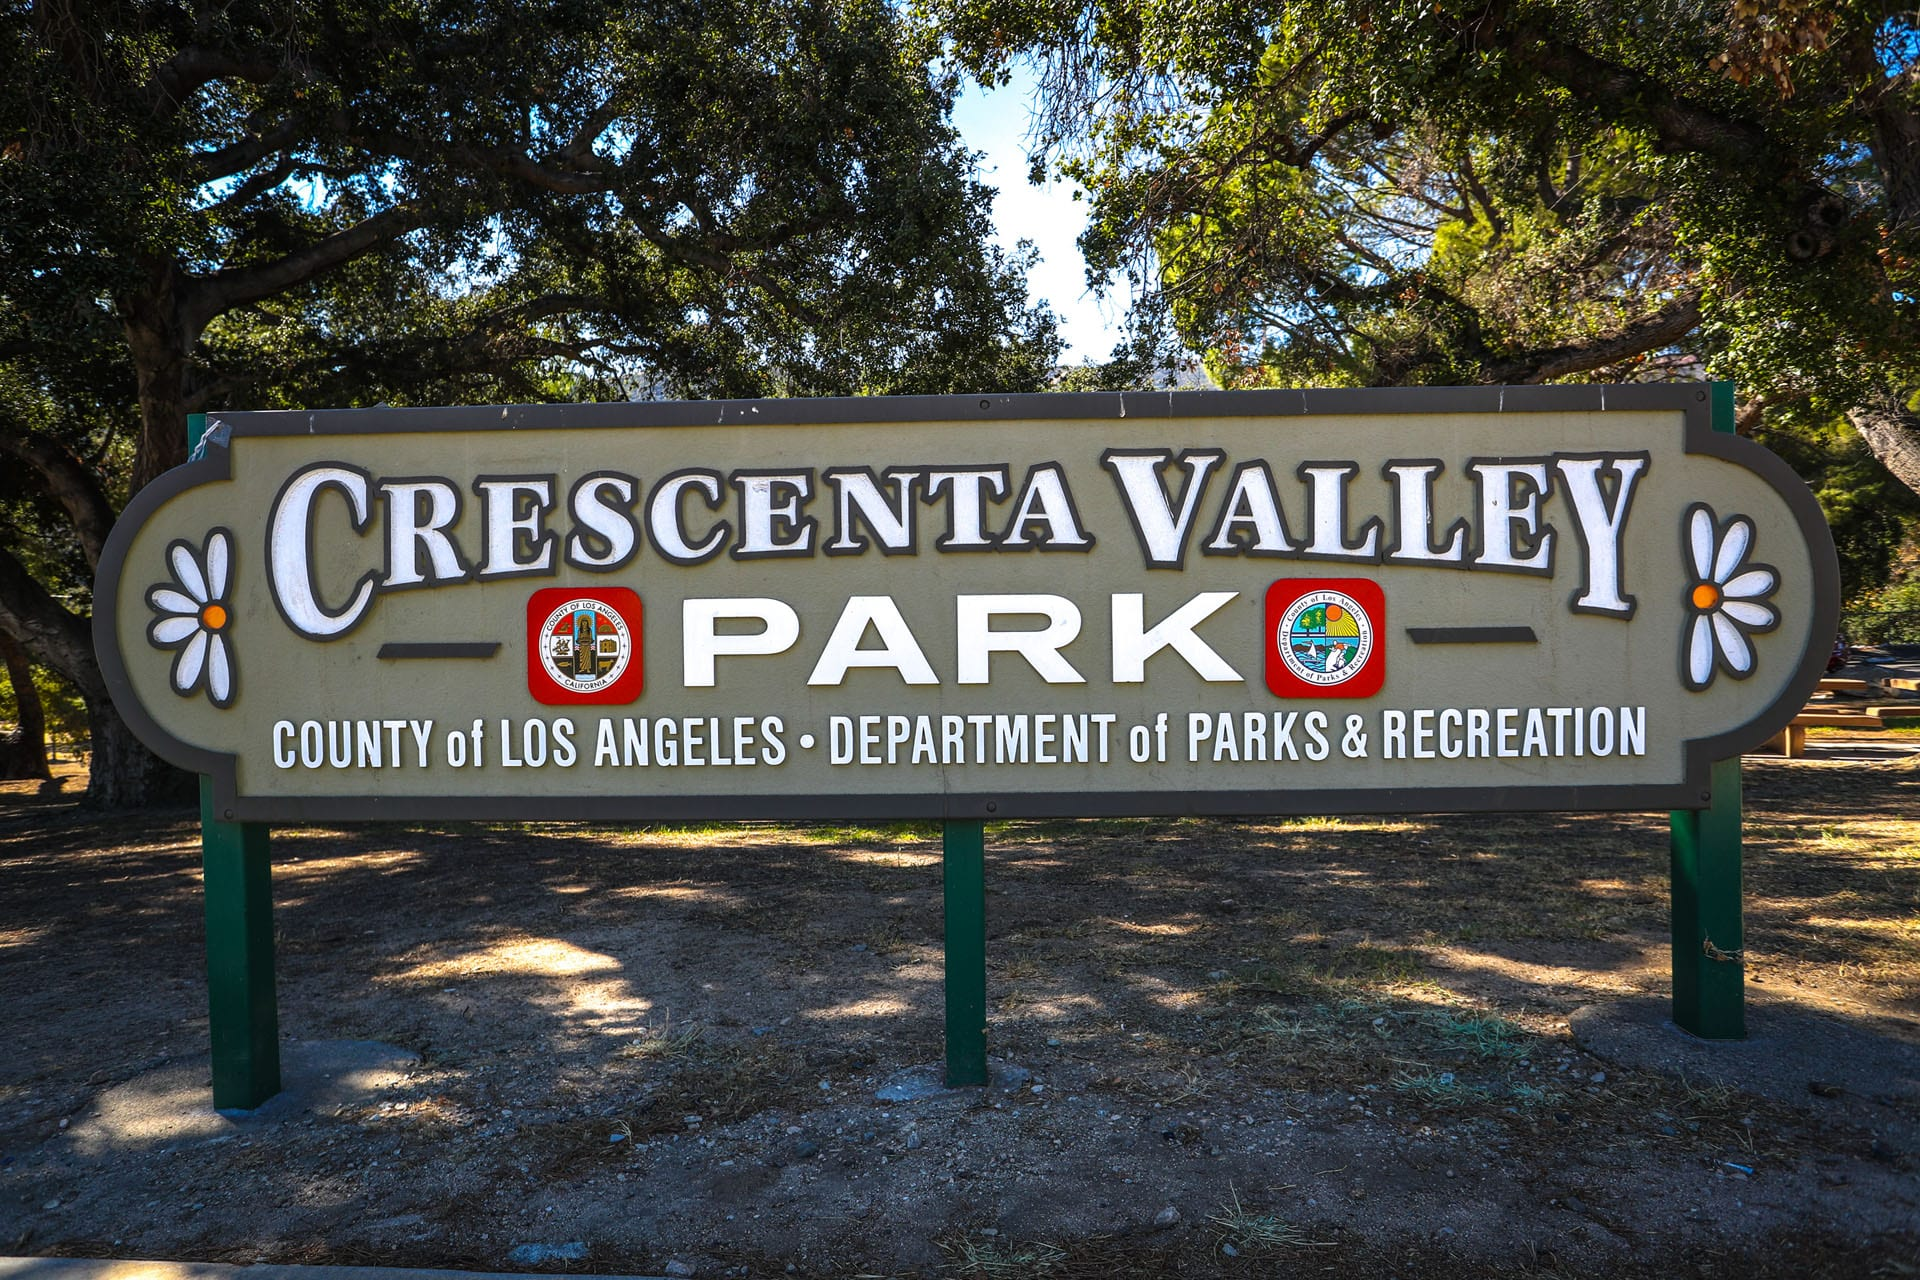 Crescenta Valley Park sign